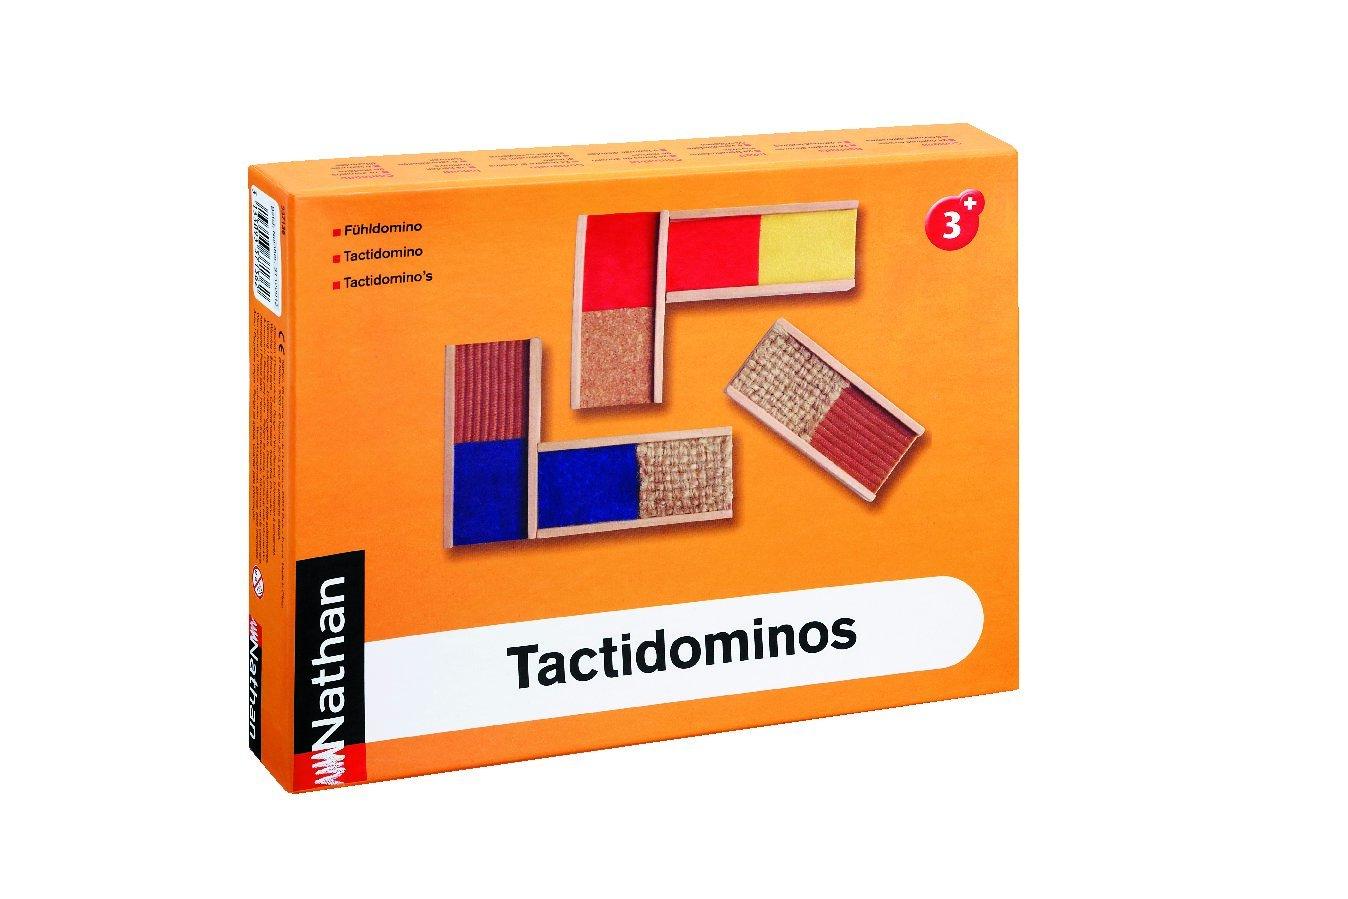 Nathan 337136 Tactidominos Sensory Game, Multi color